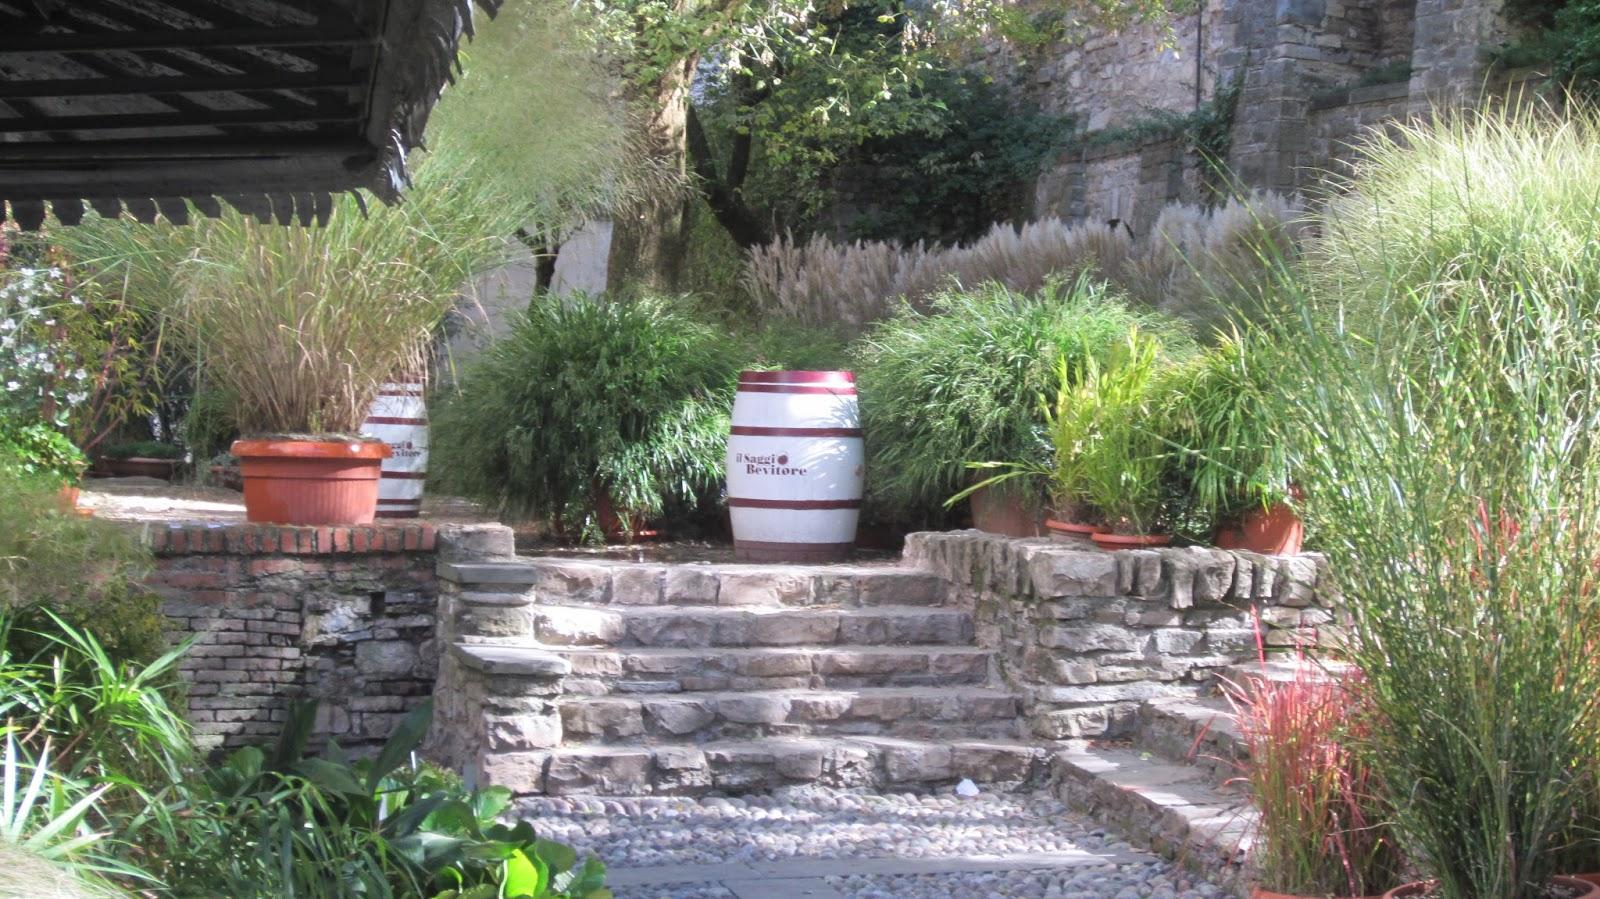 I maestri del paesaggio john brookes raves rants - Garden design john brookes ...